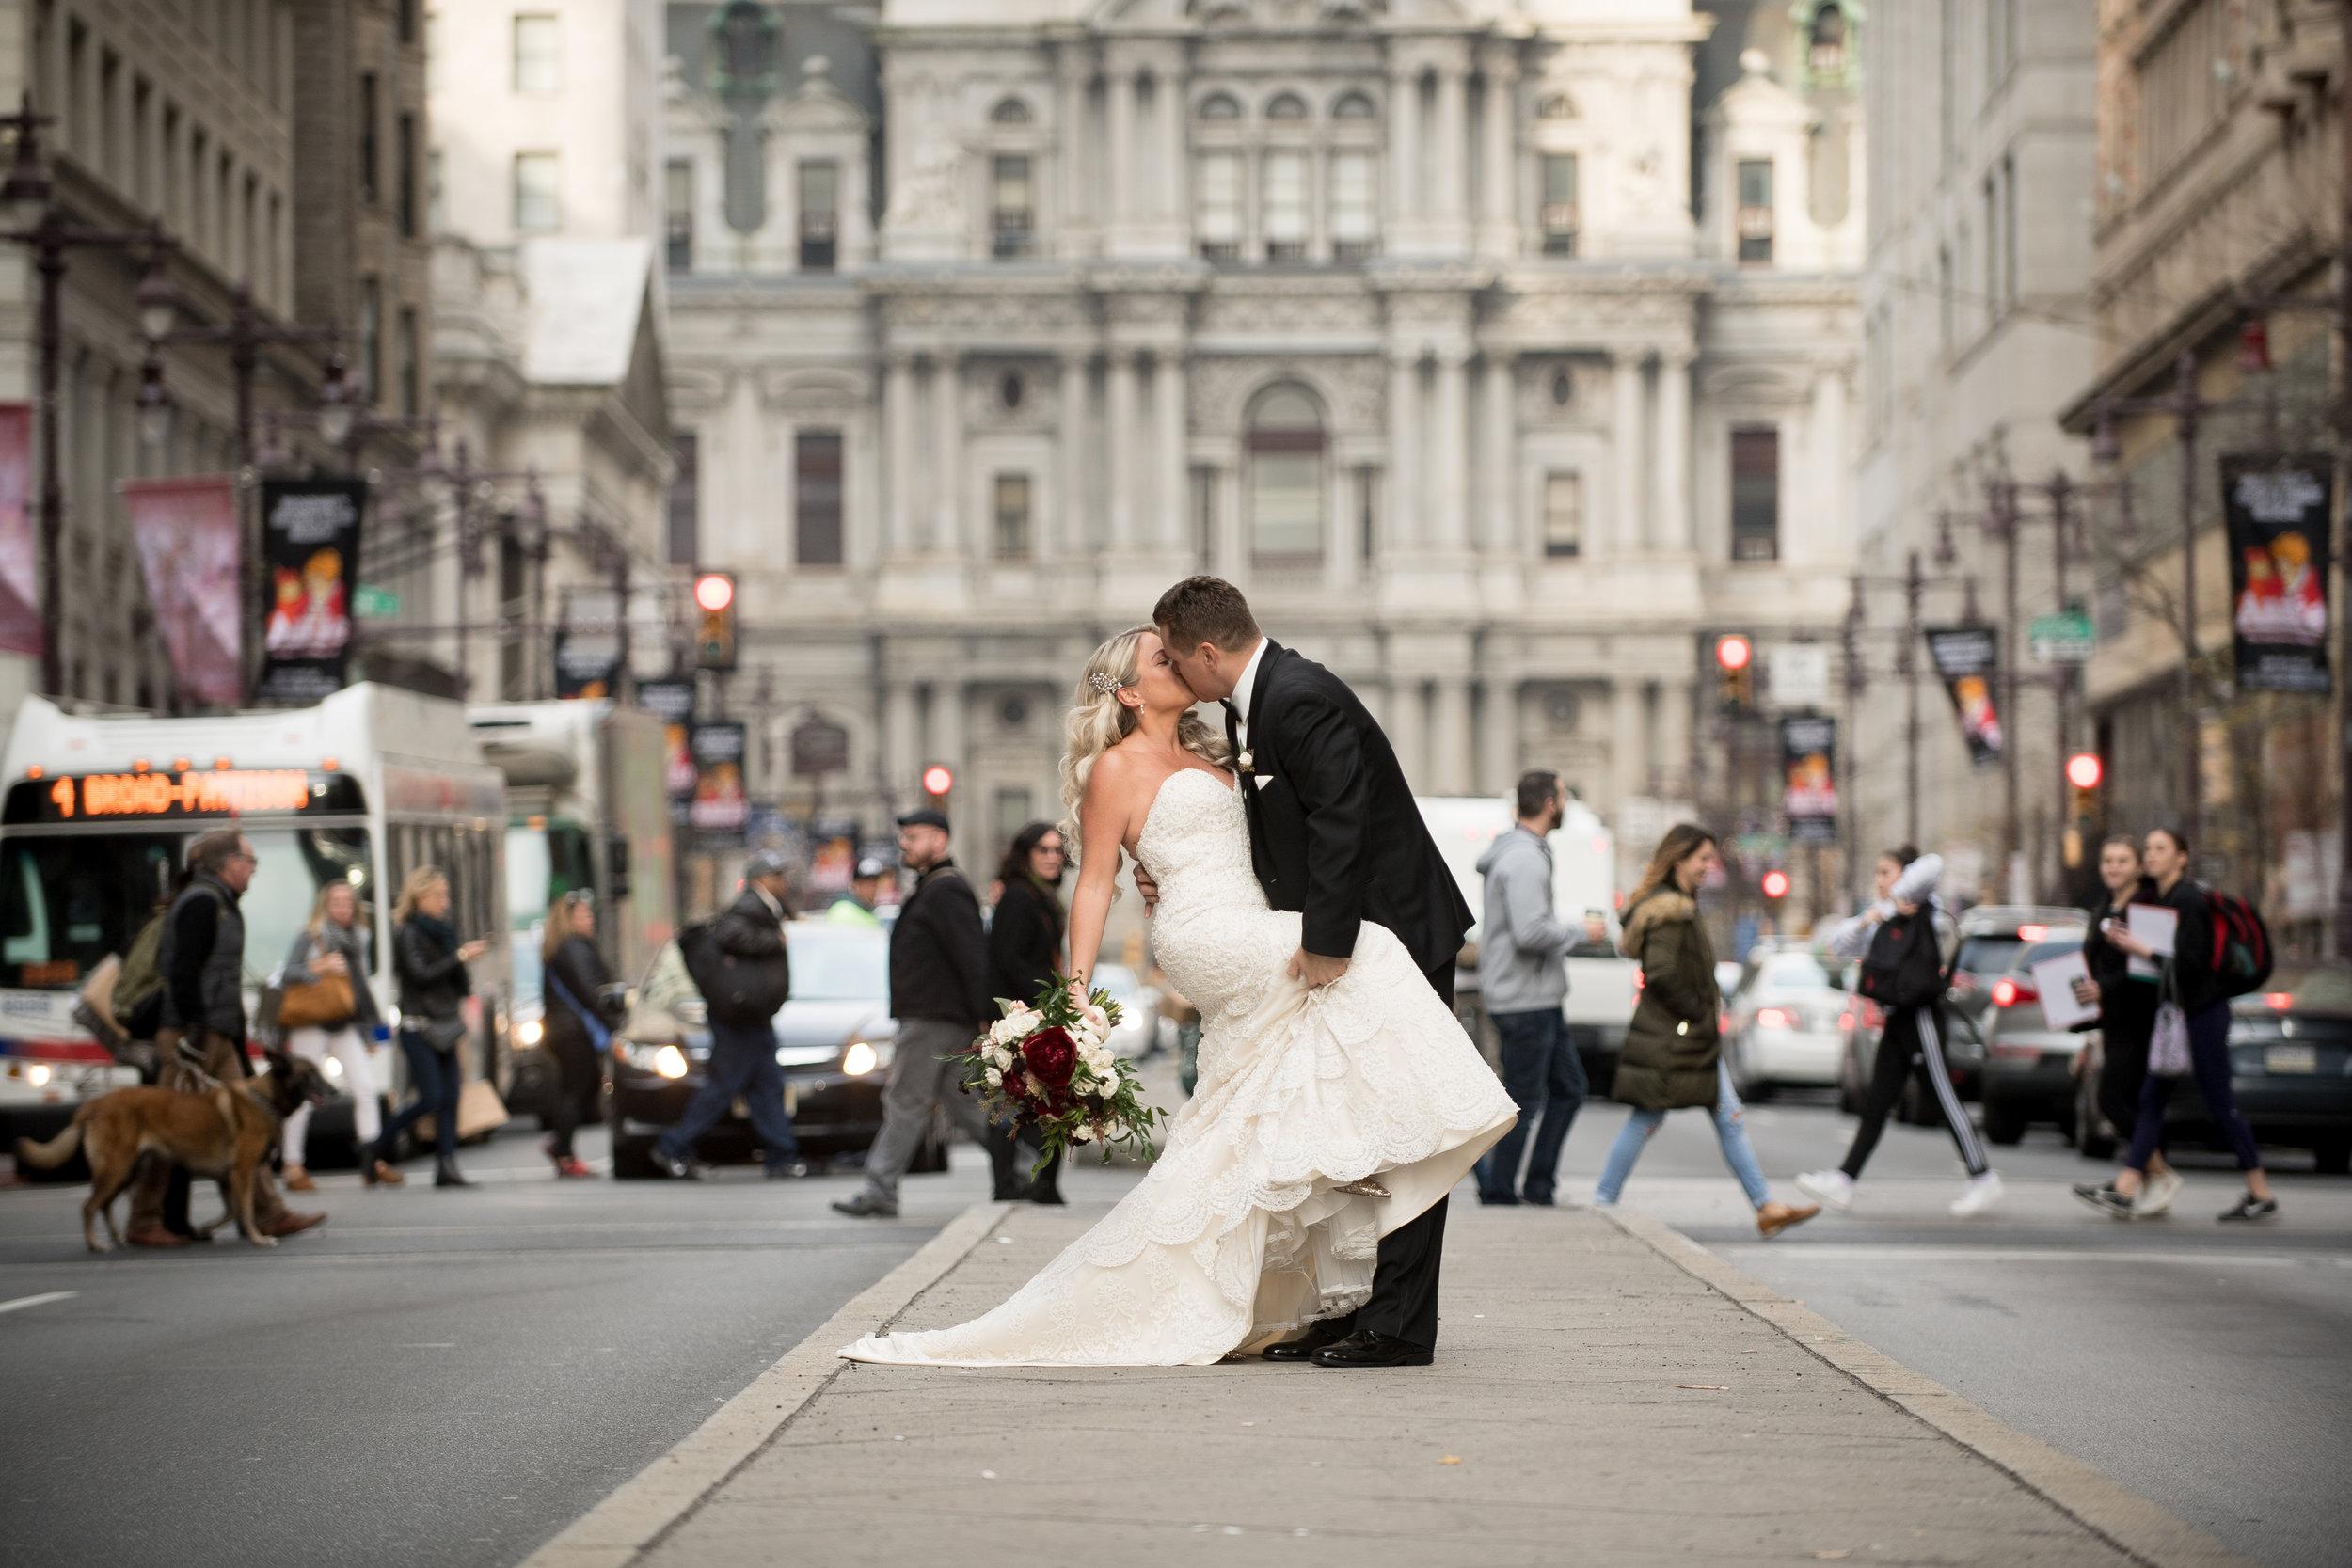 curtis-atrium-wedding-philadelphia-christine-charles-24.jpg